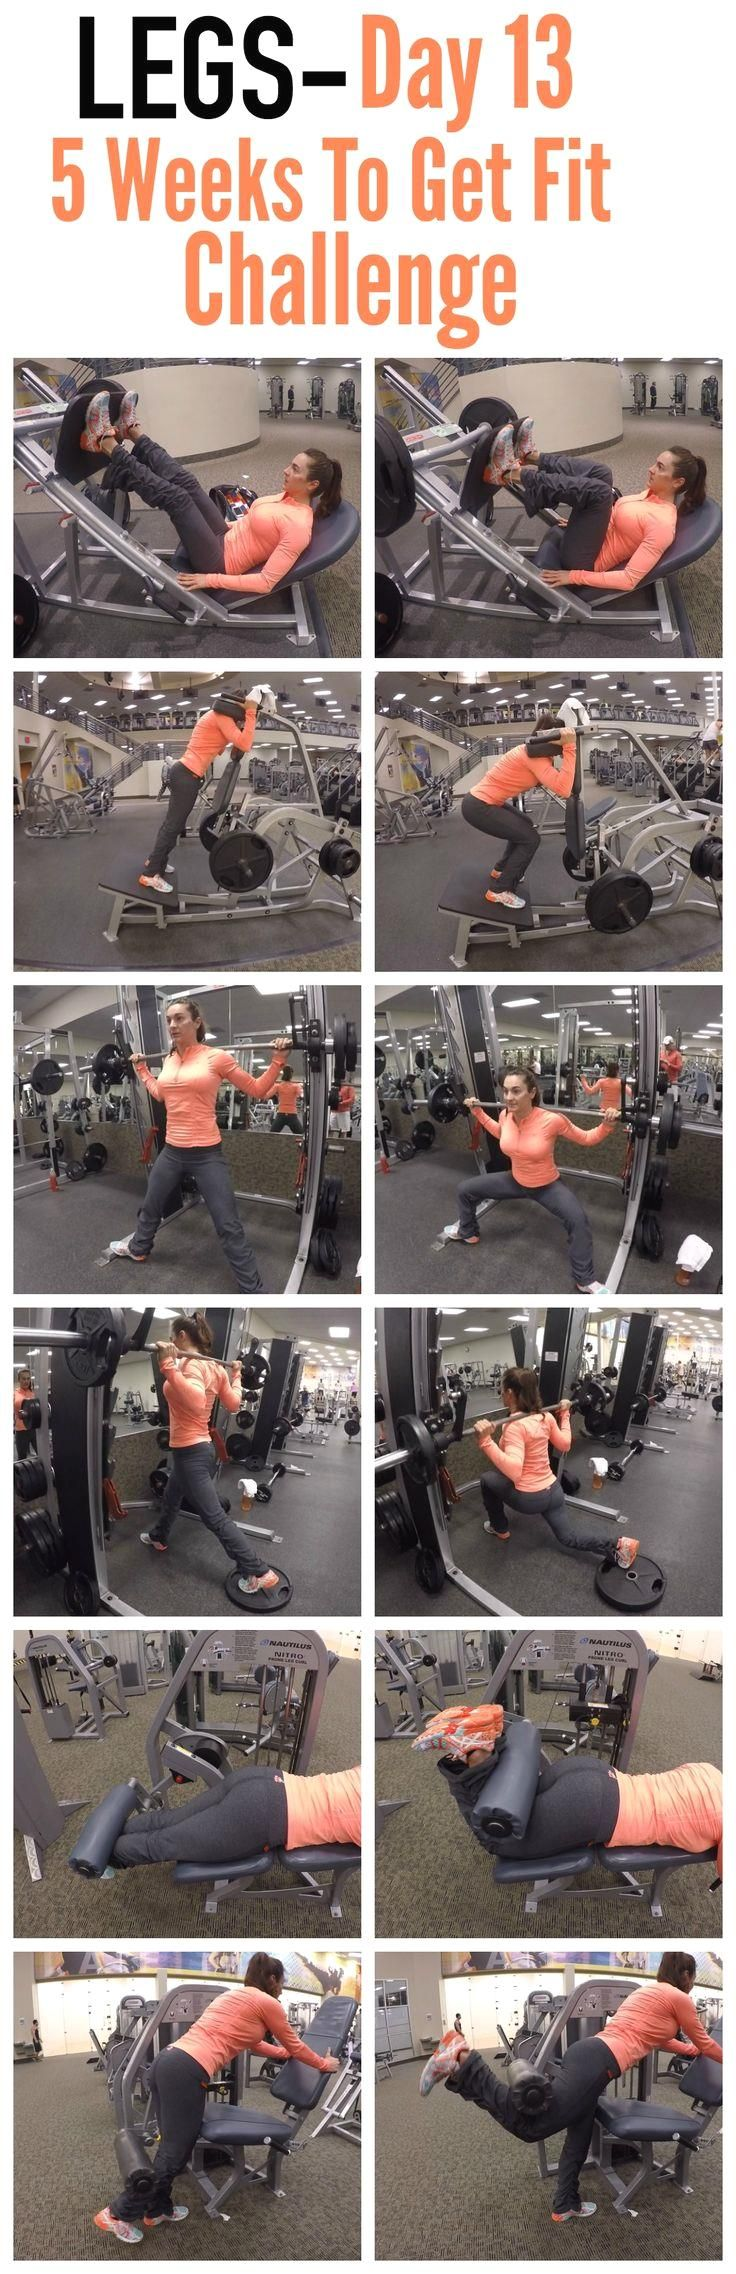 5 Weeks To Get Fit C  5 Weeks To Get Fit Challenge Day 13-LEGS.